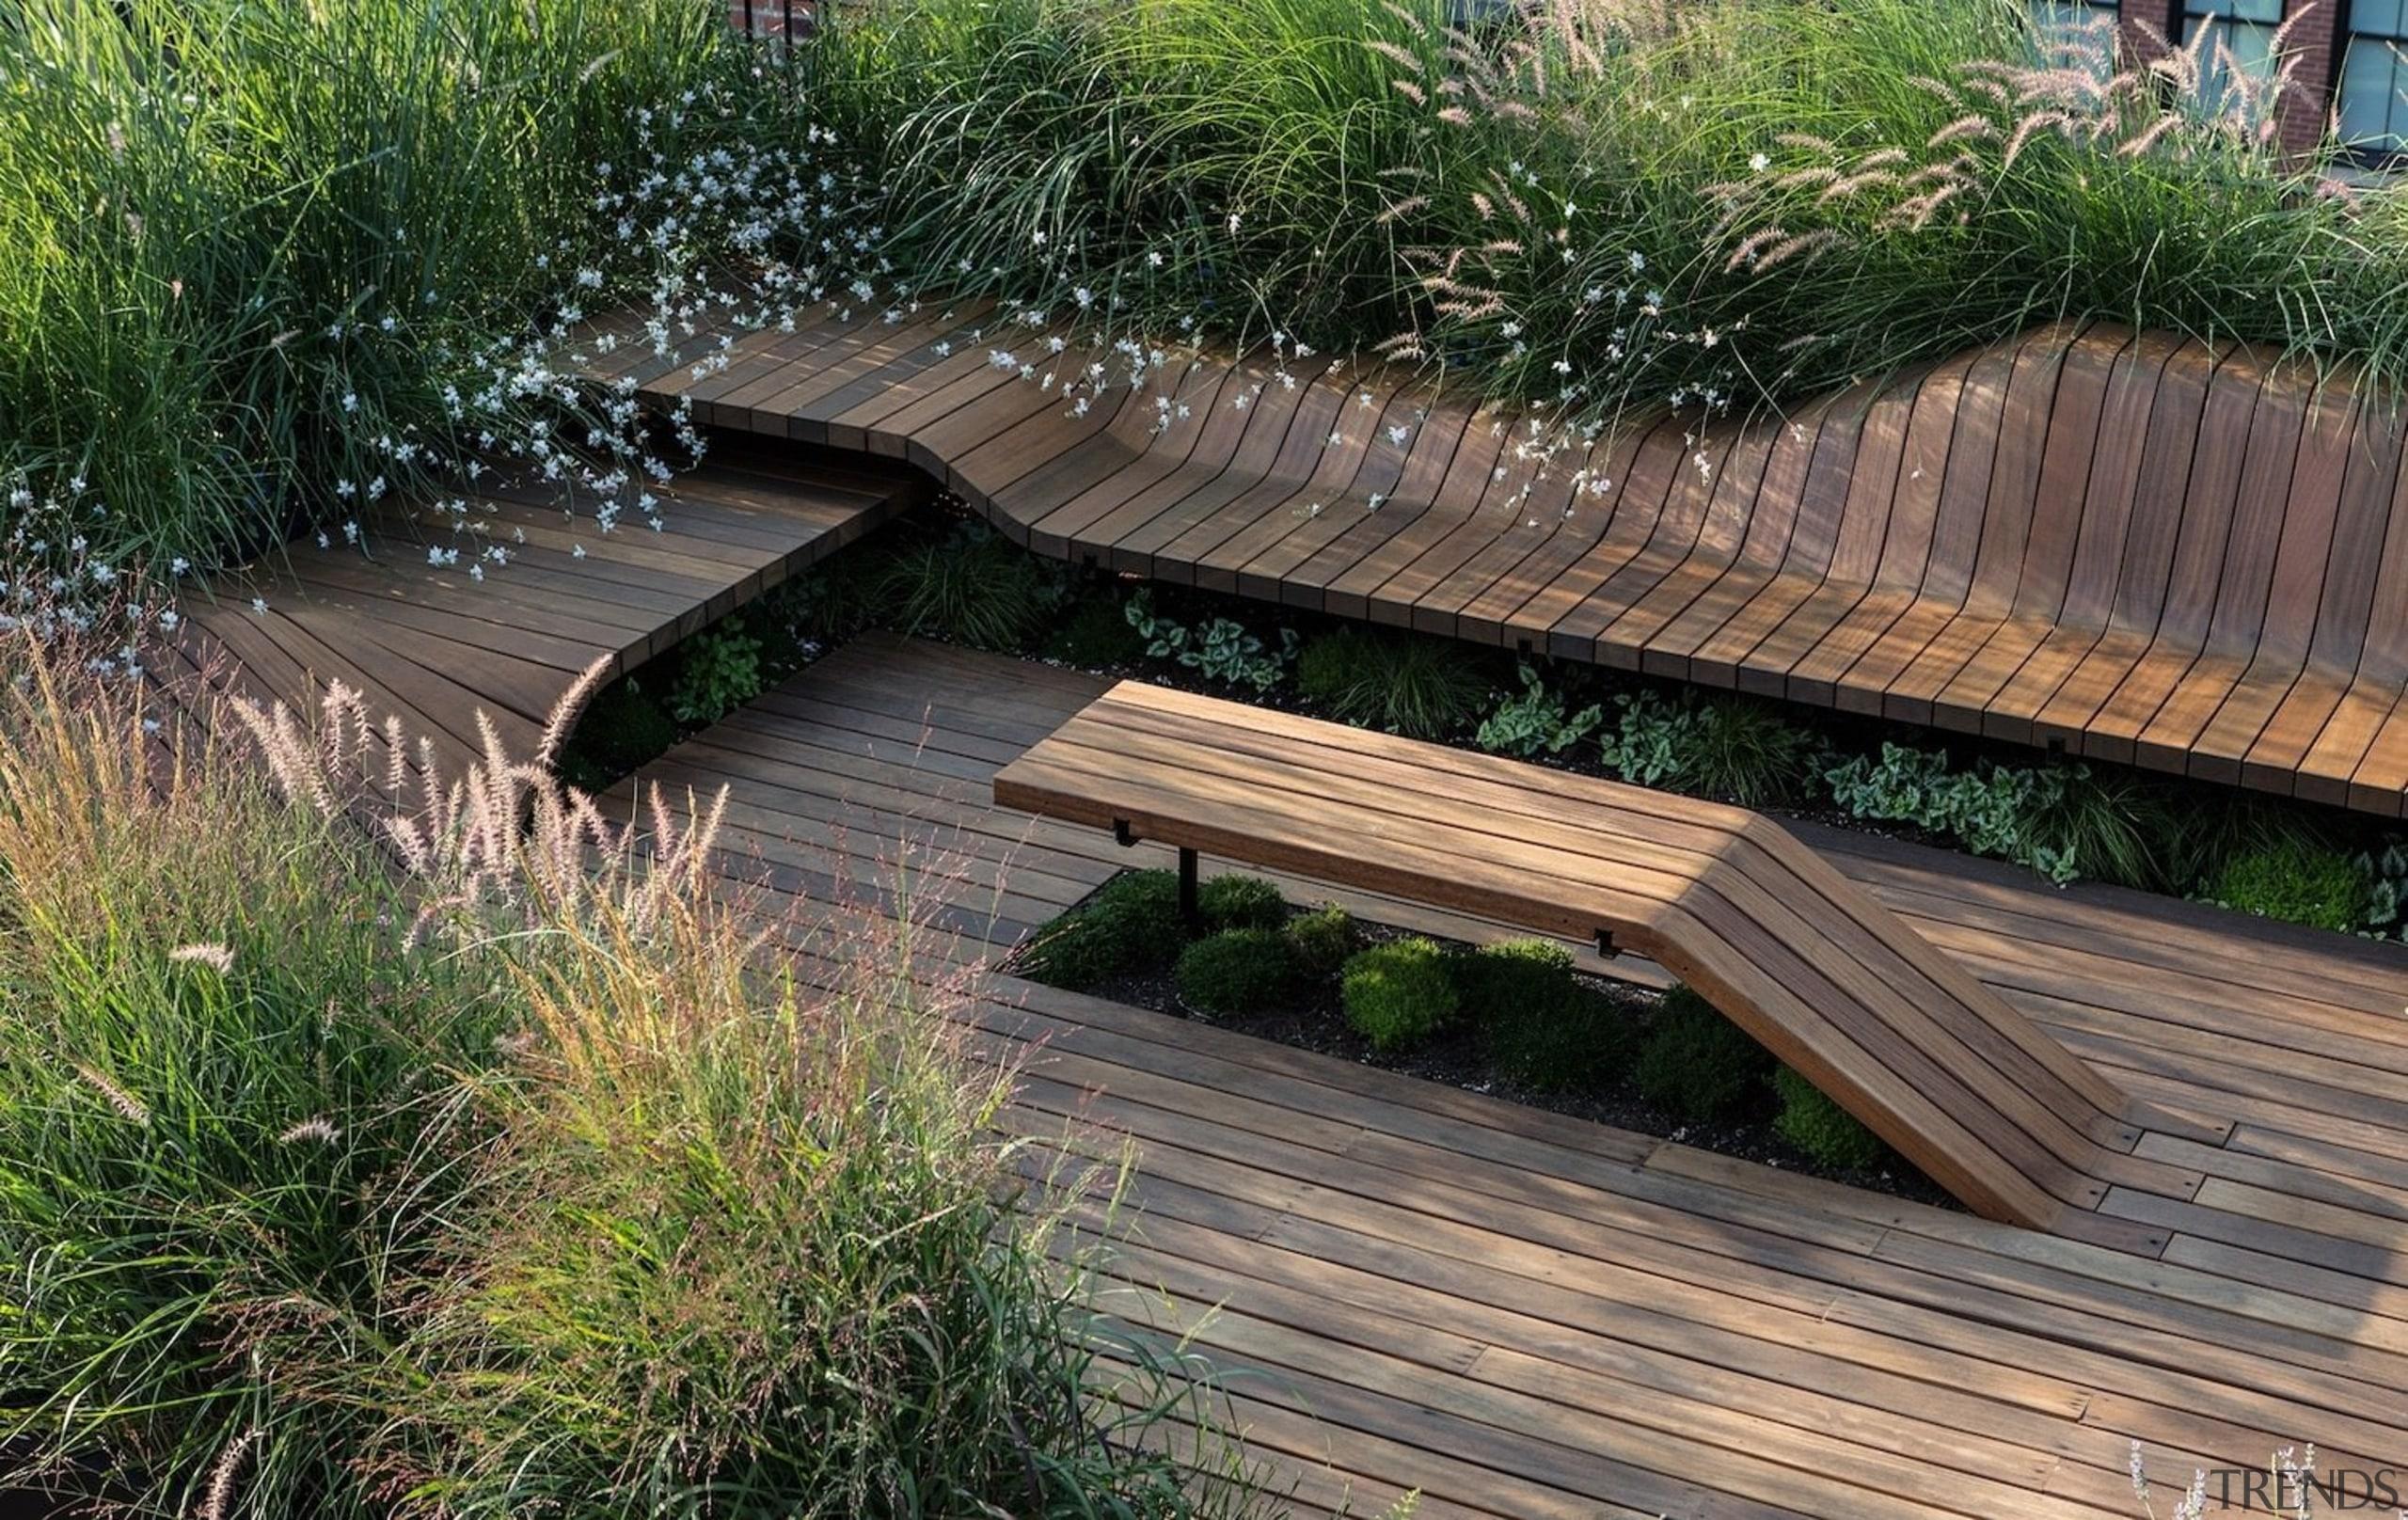 Architect: J.Roc Design bench, deck, grass, outdoor furniture, outdoor structure, path, walkway, wood, gray